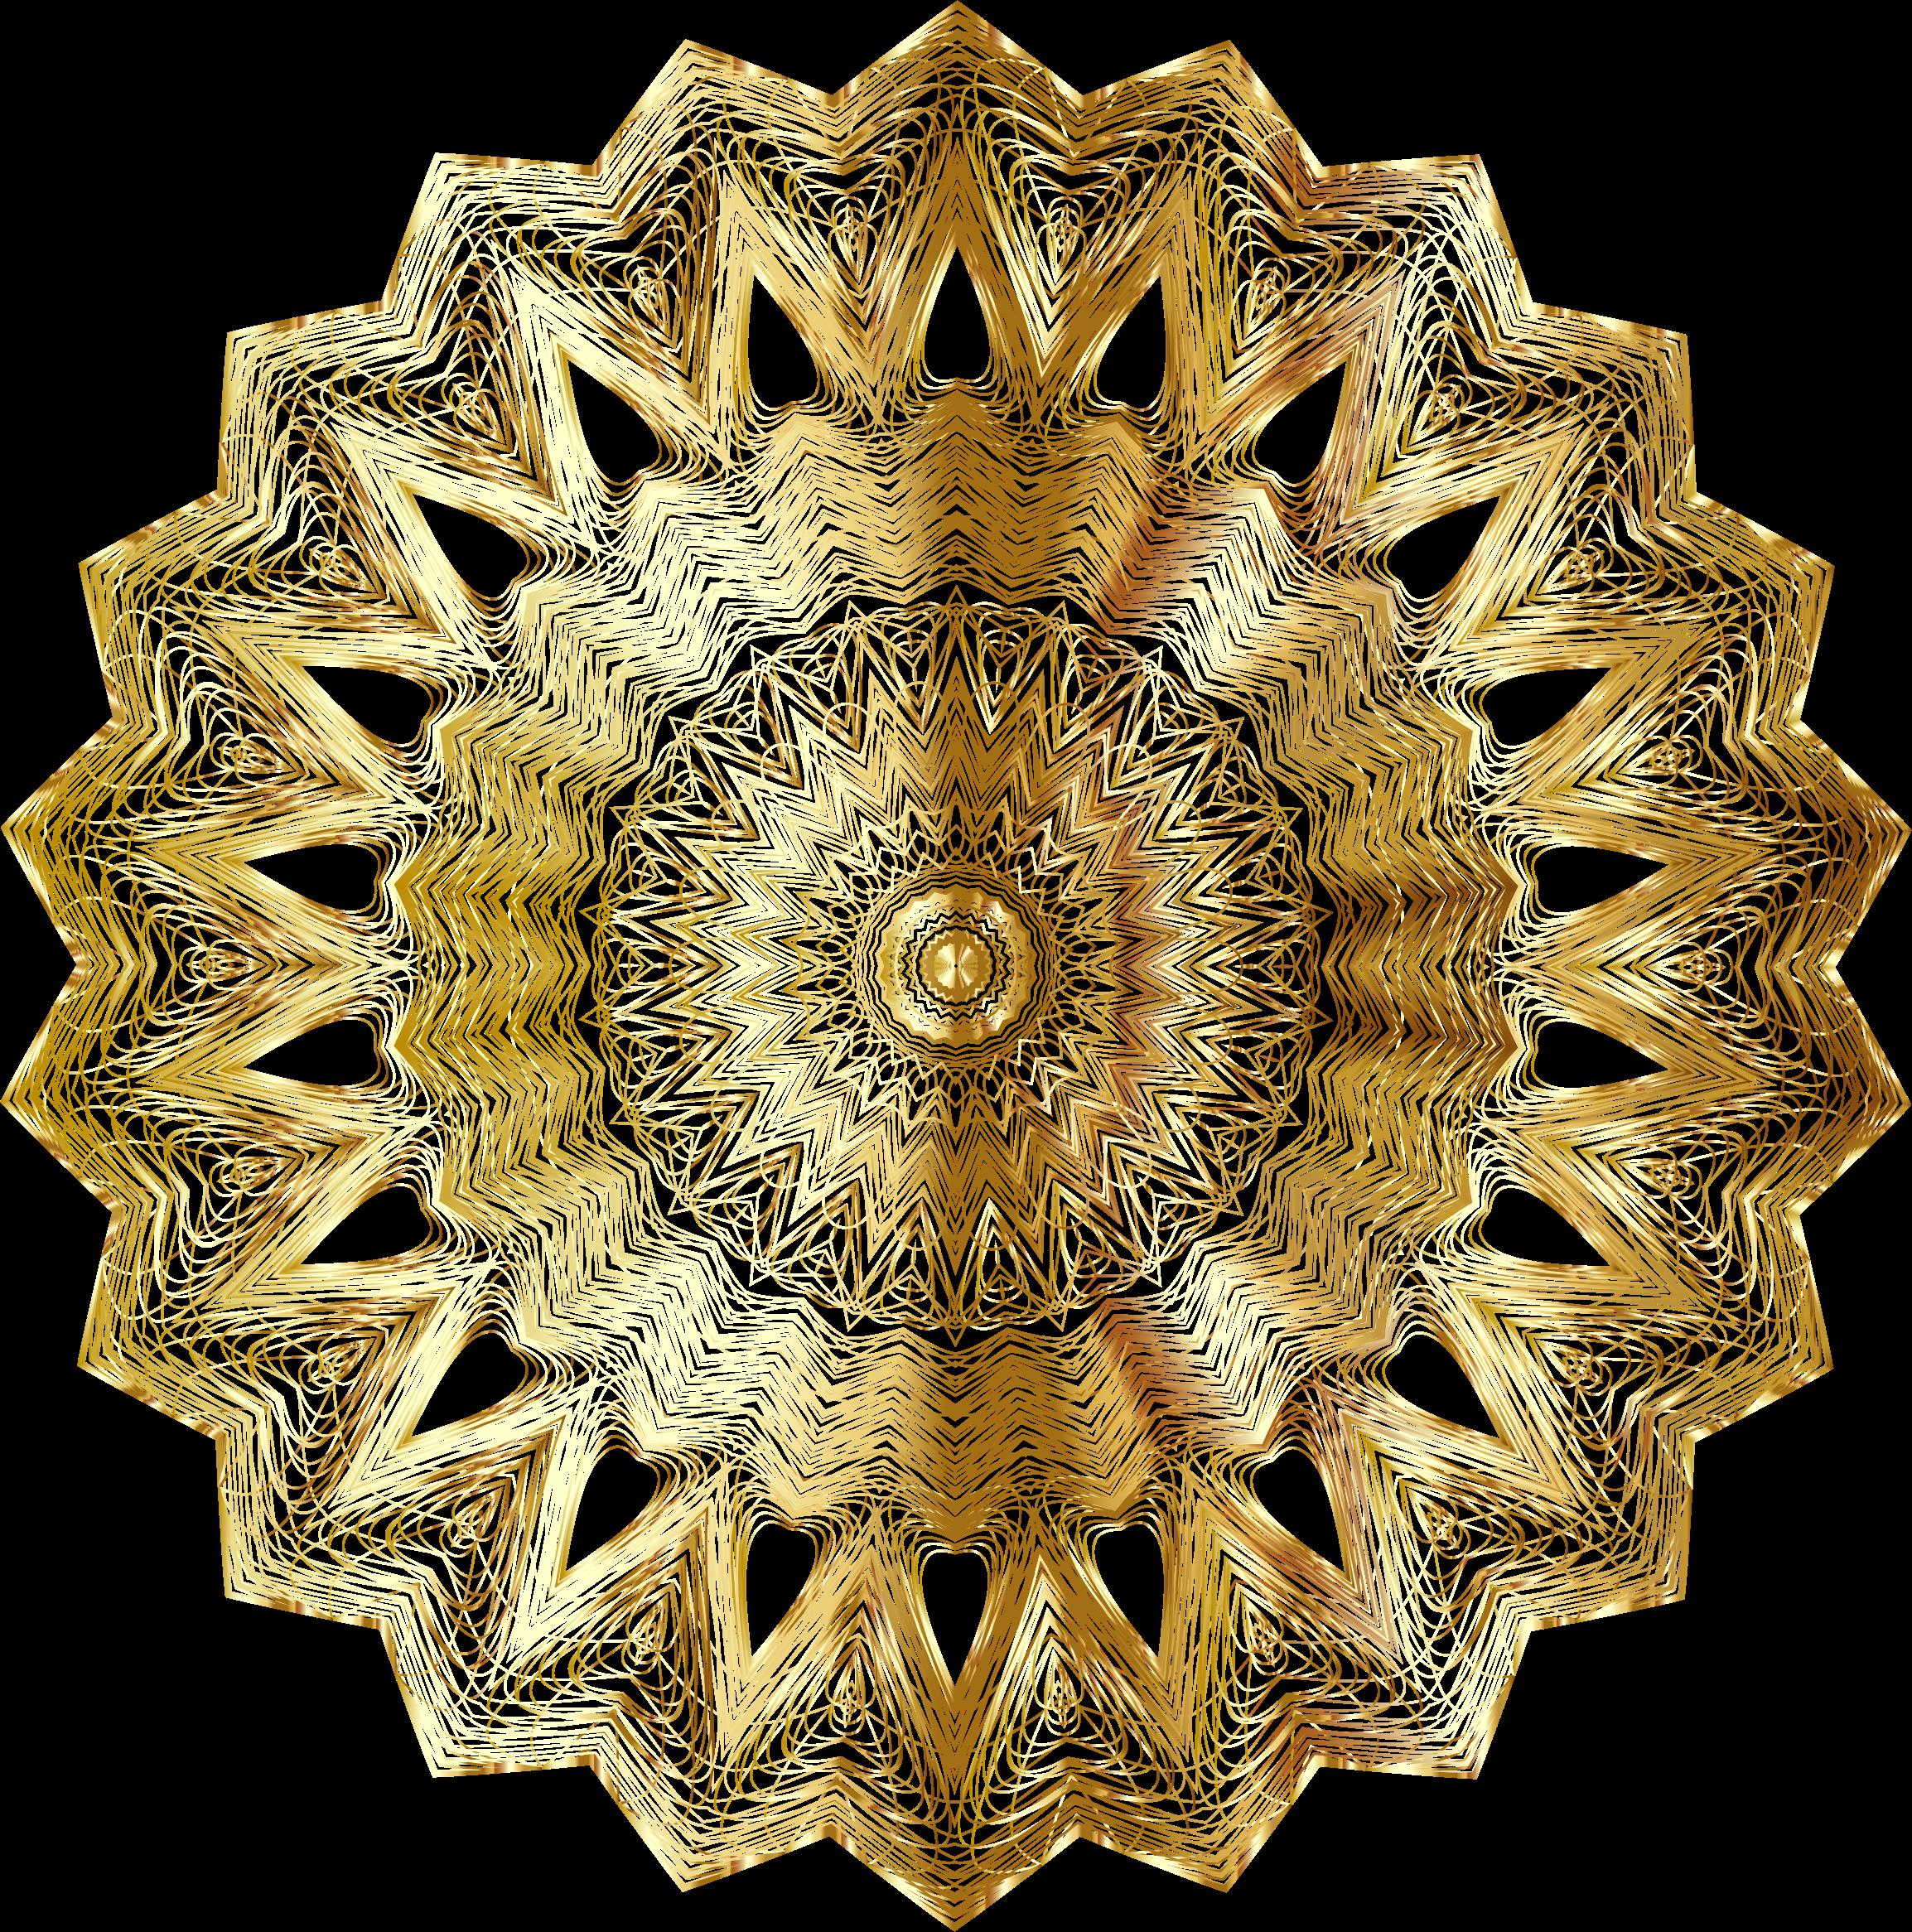 Golden sun clipart clipart download Clipart - Golden Sun No Background clipart download